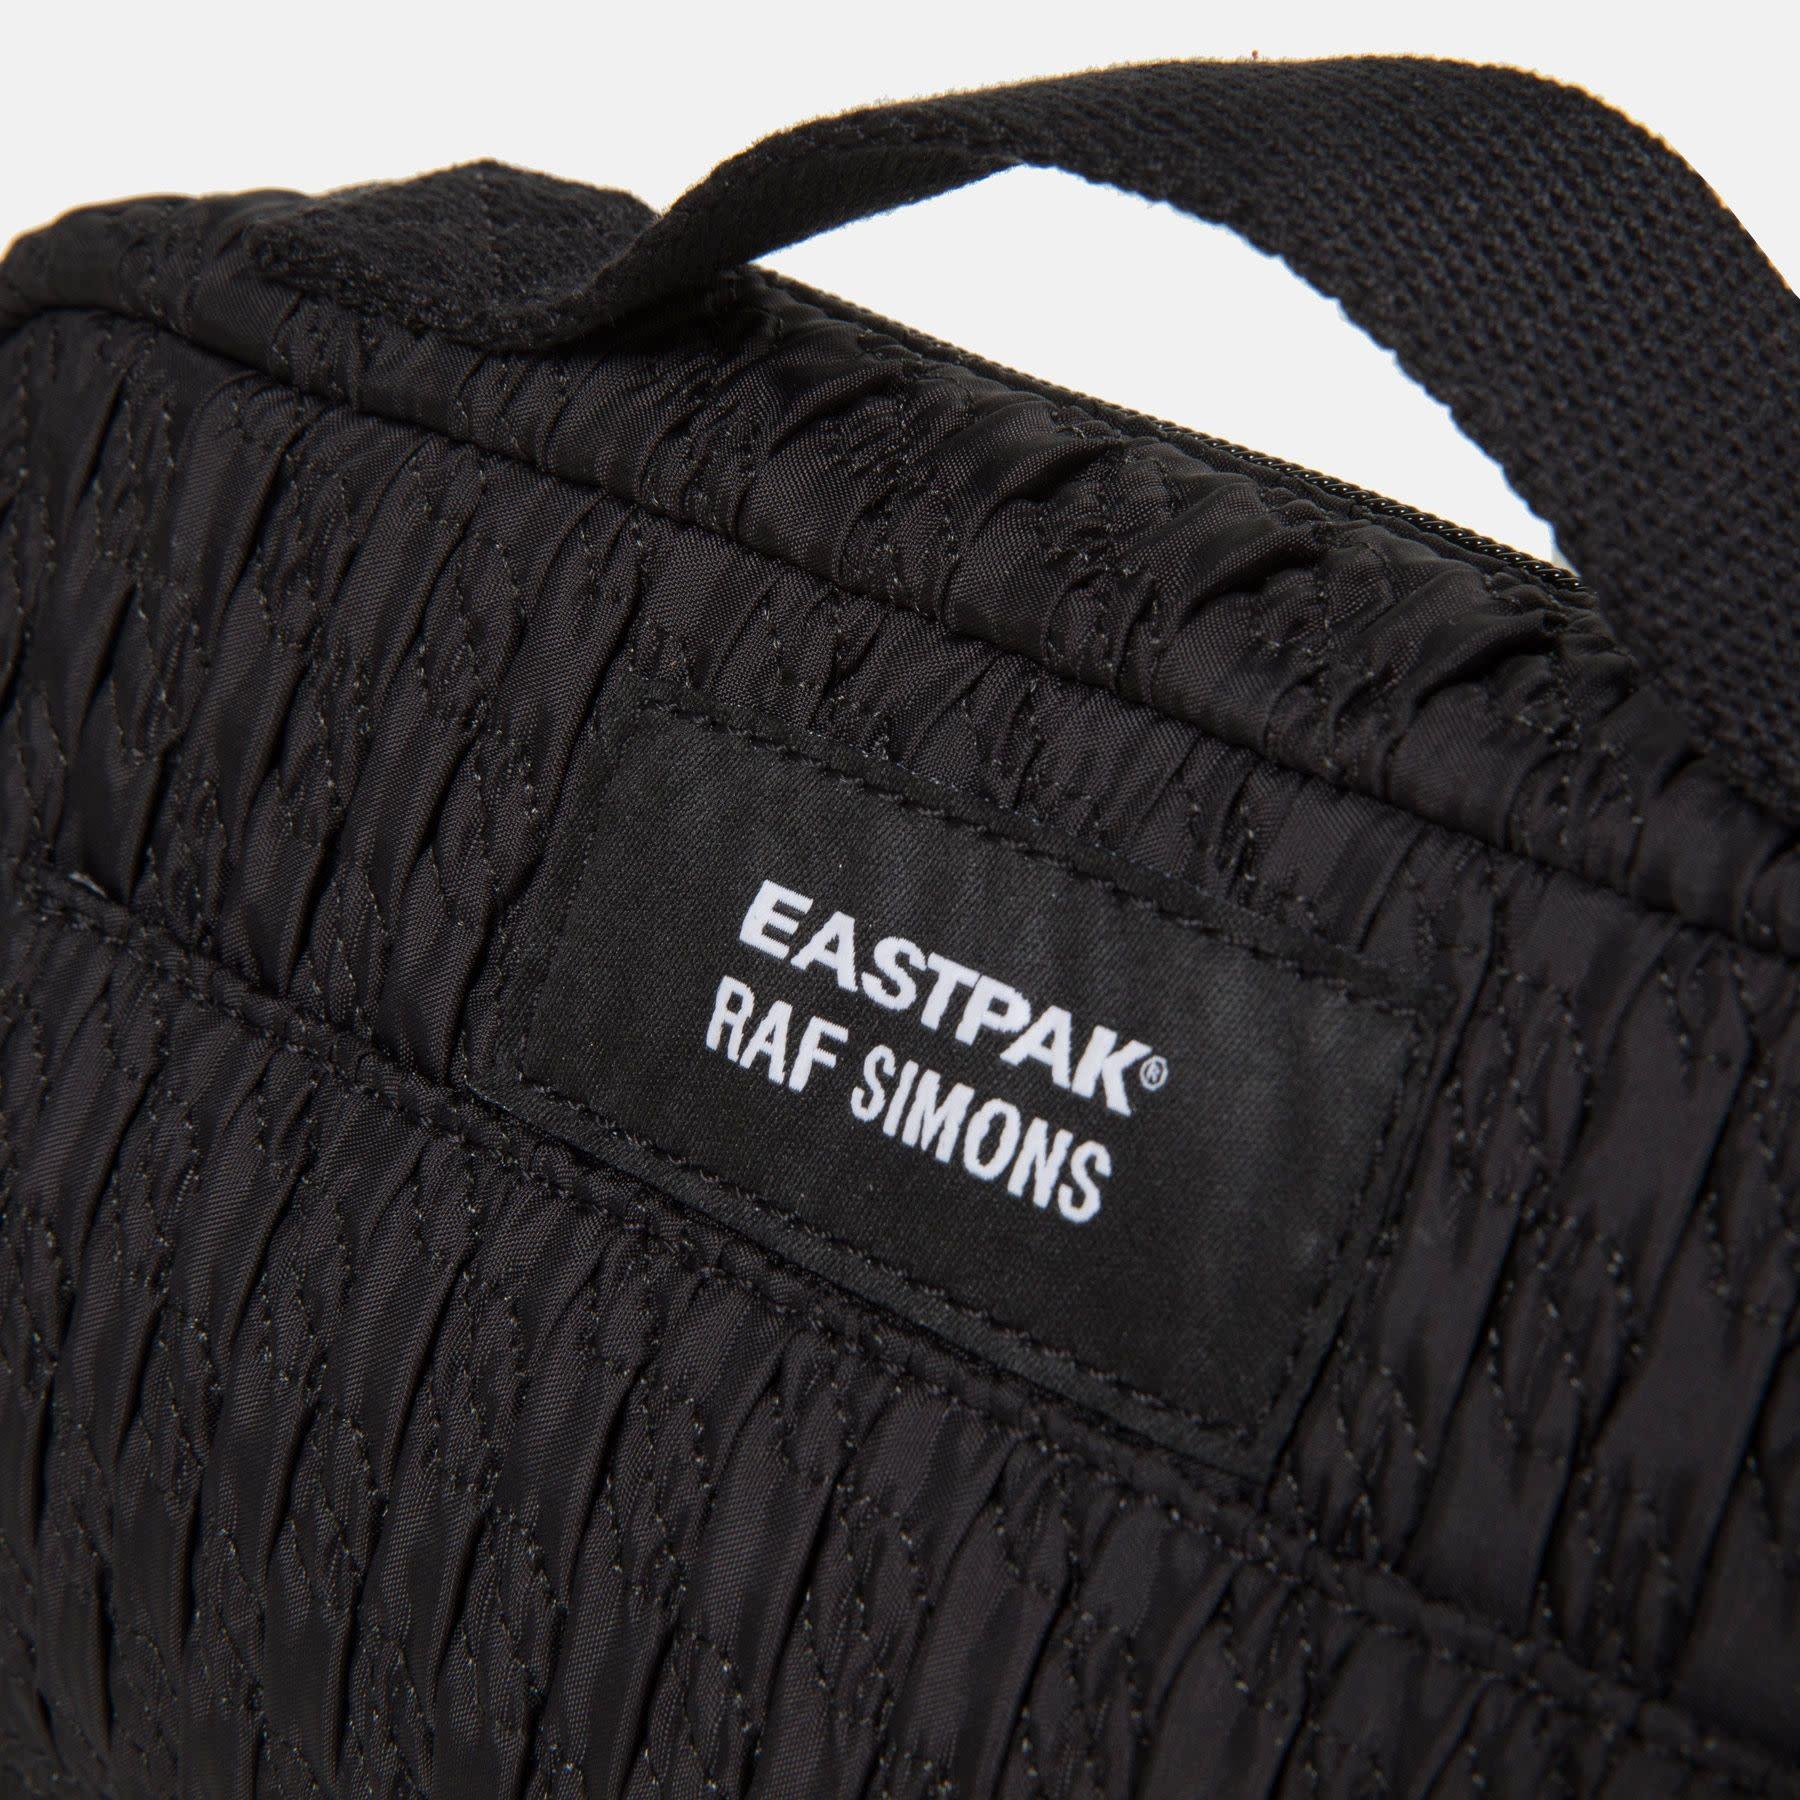 RAF SIMONS Raf Simons X Eastpak Loop Waist Bag in Black Matlasse